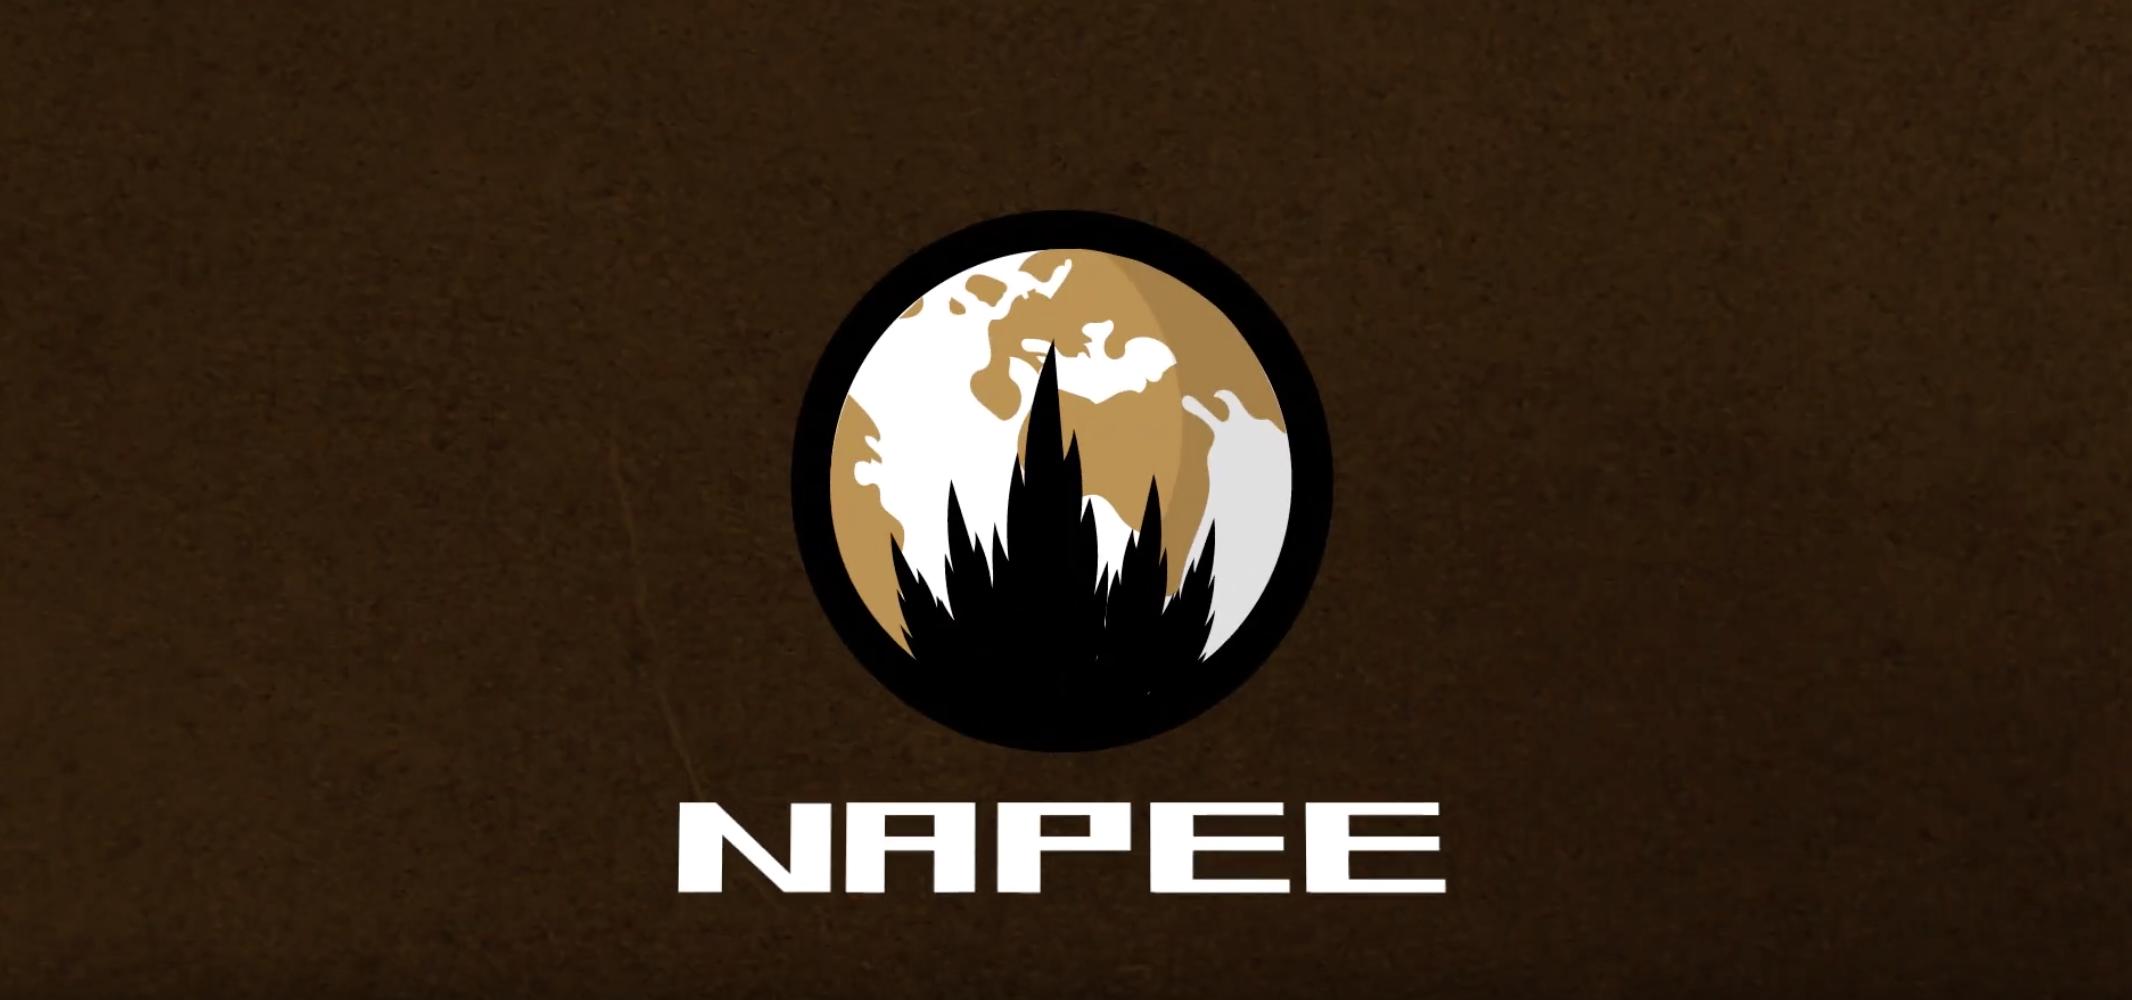 Napee ID logo